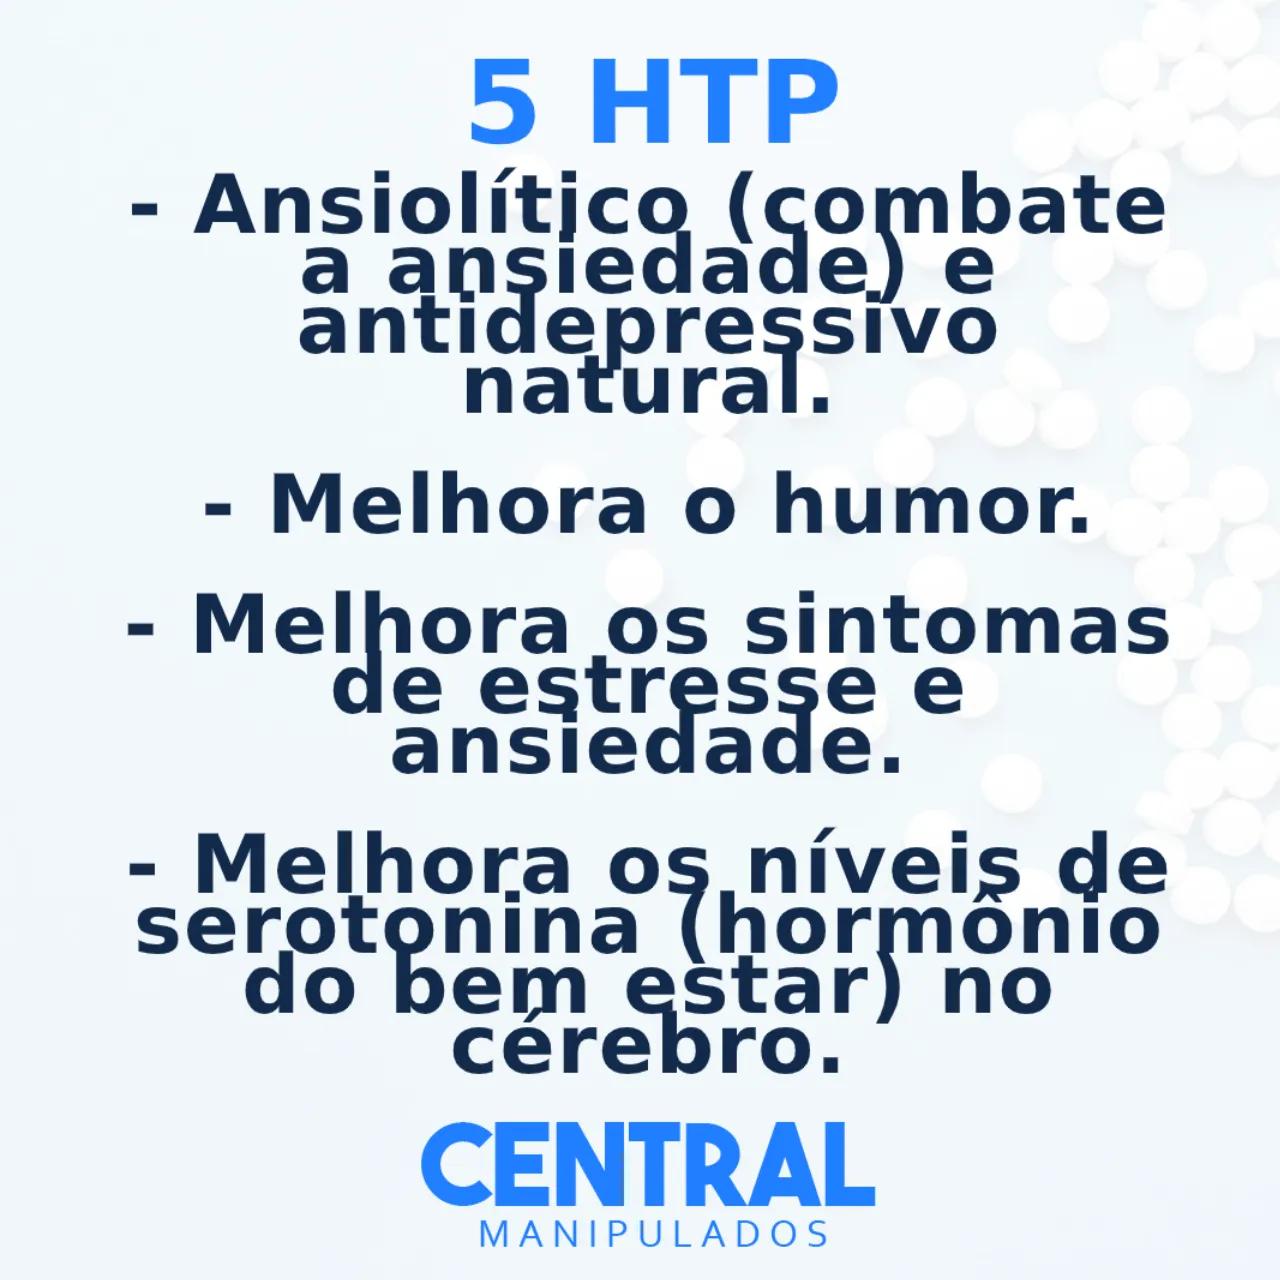 5 HTP 50mg - 90 cápsulas - Ansiolítico e antidepressivo natural